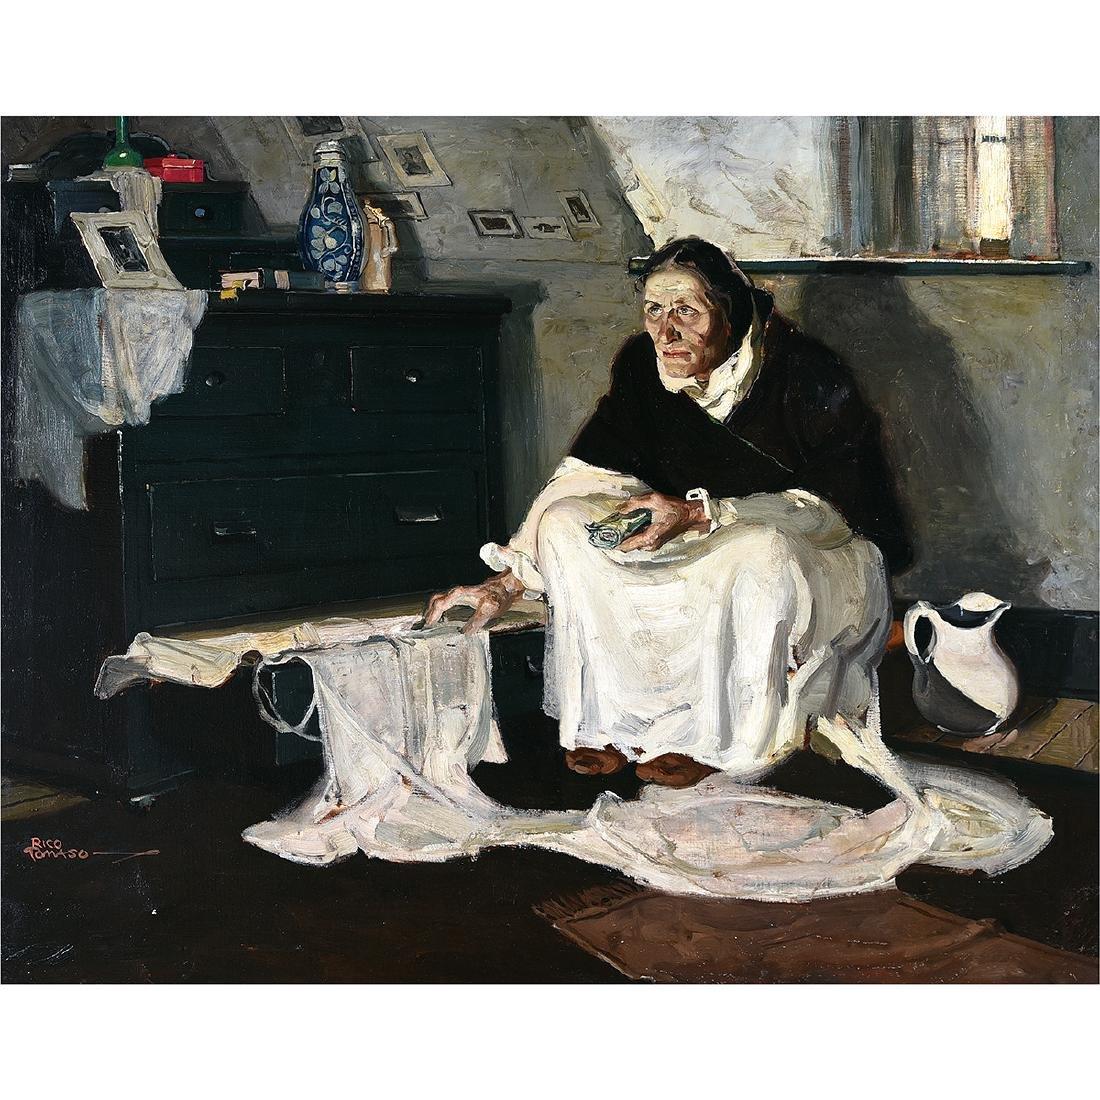 "Rico Tomaso ""Haunted"" oil on canvas"